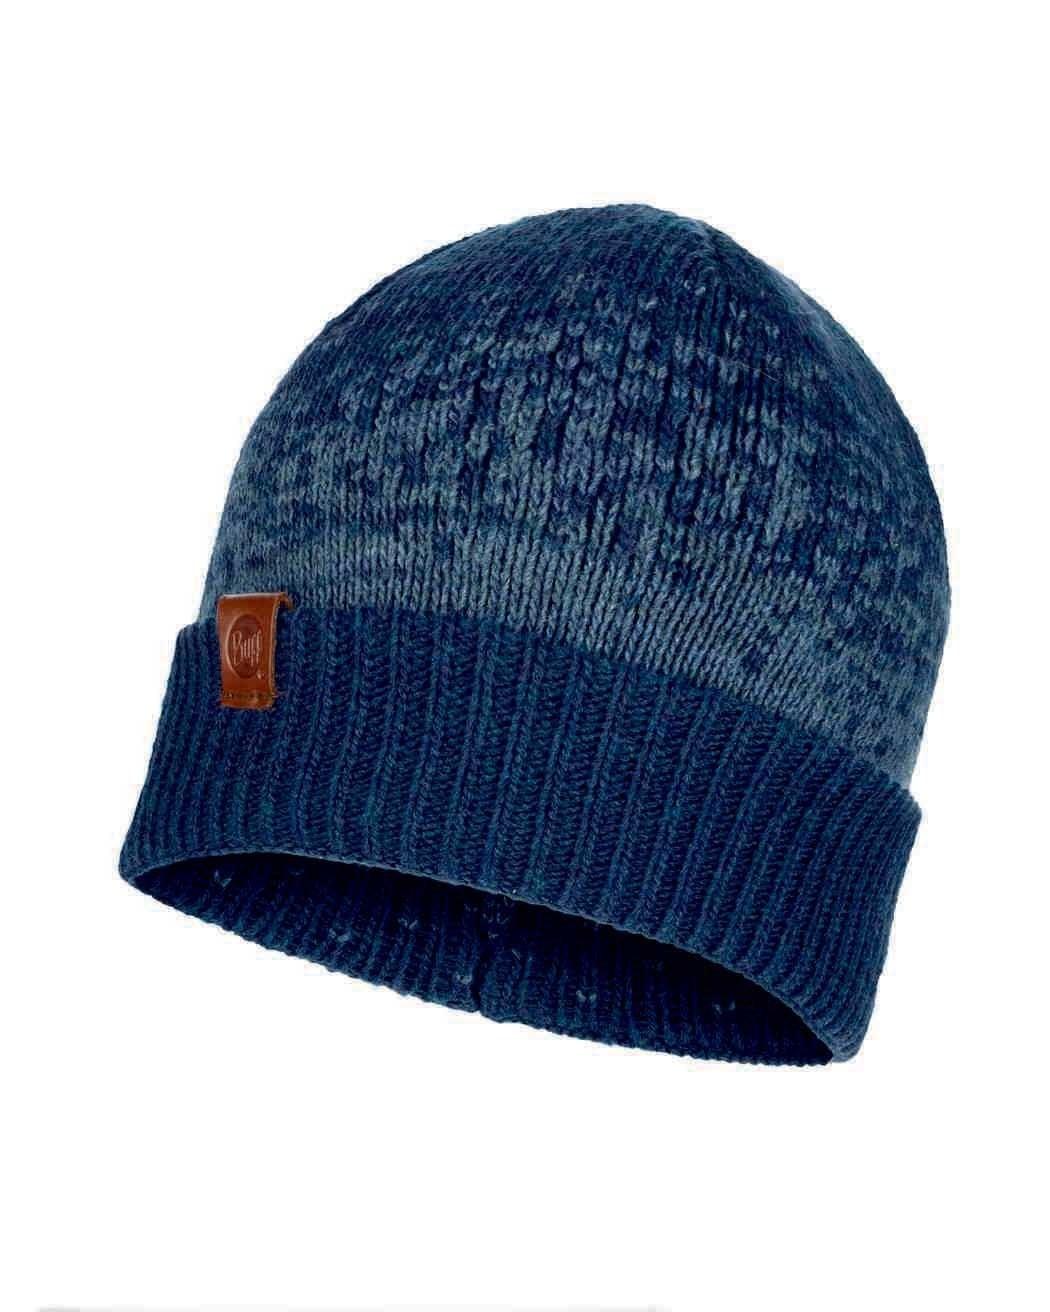 Шапки средней вязки Вязаная шапка Buff Hat Knitted Valter Navy 117890.787.10.00.jpg